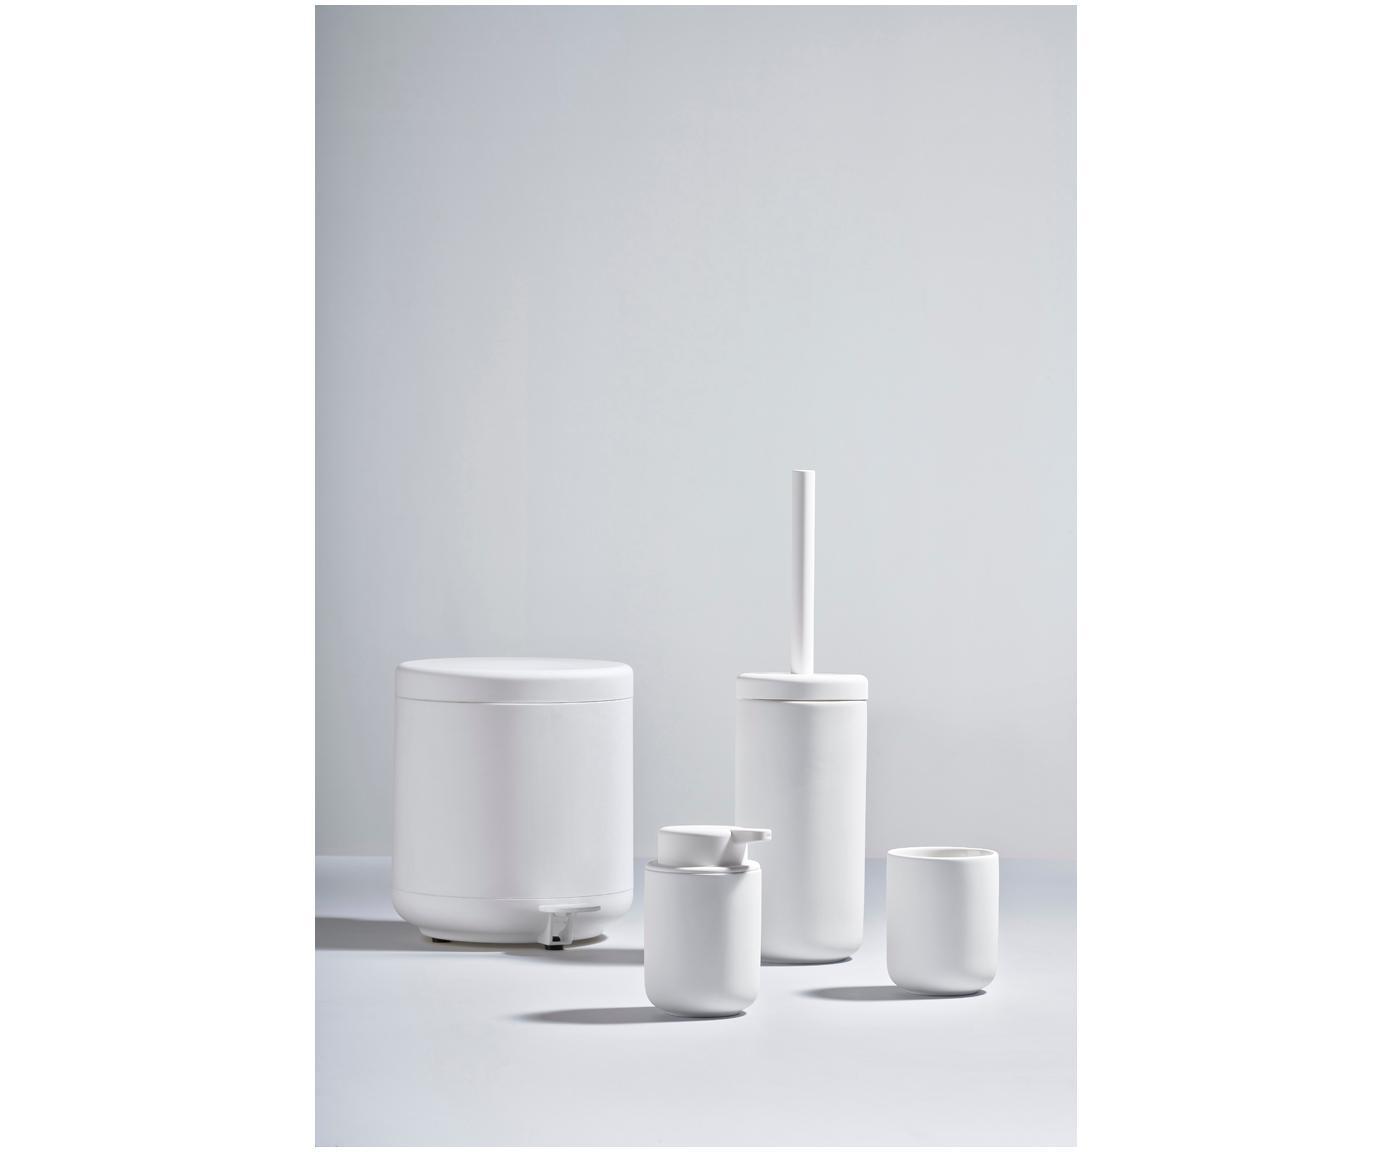 Tandenborstelbeker Omega, Keramiek overtrokken met soft-touch oppervlak (kunststof), Mat wit, Ø 8 x H 10 cm